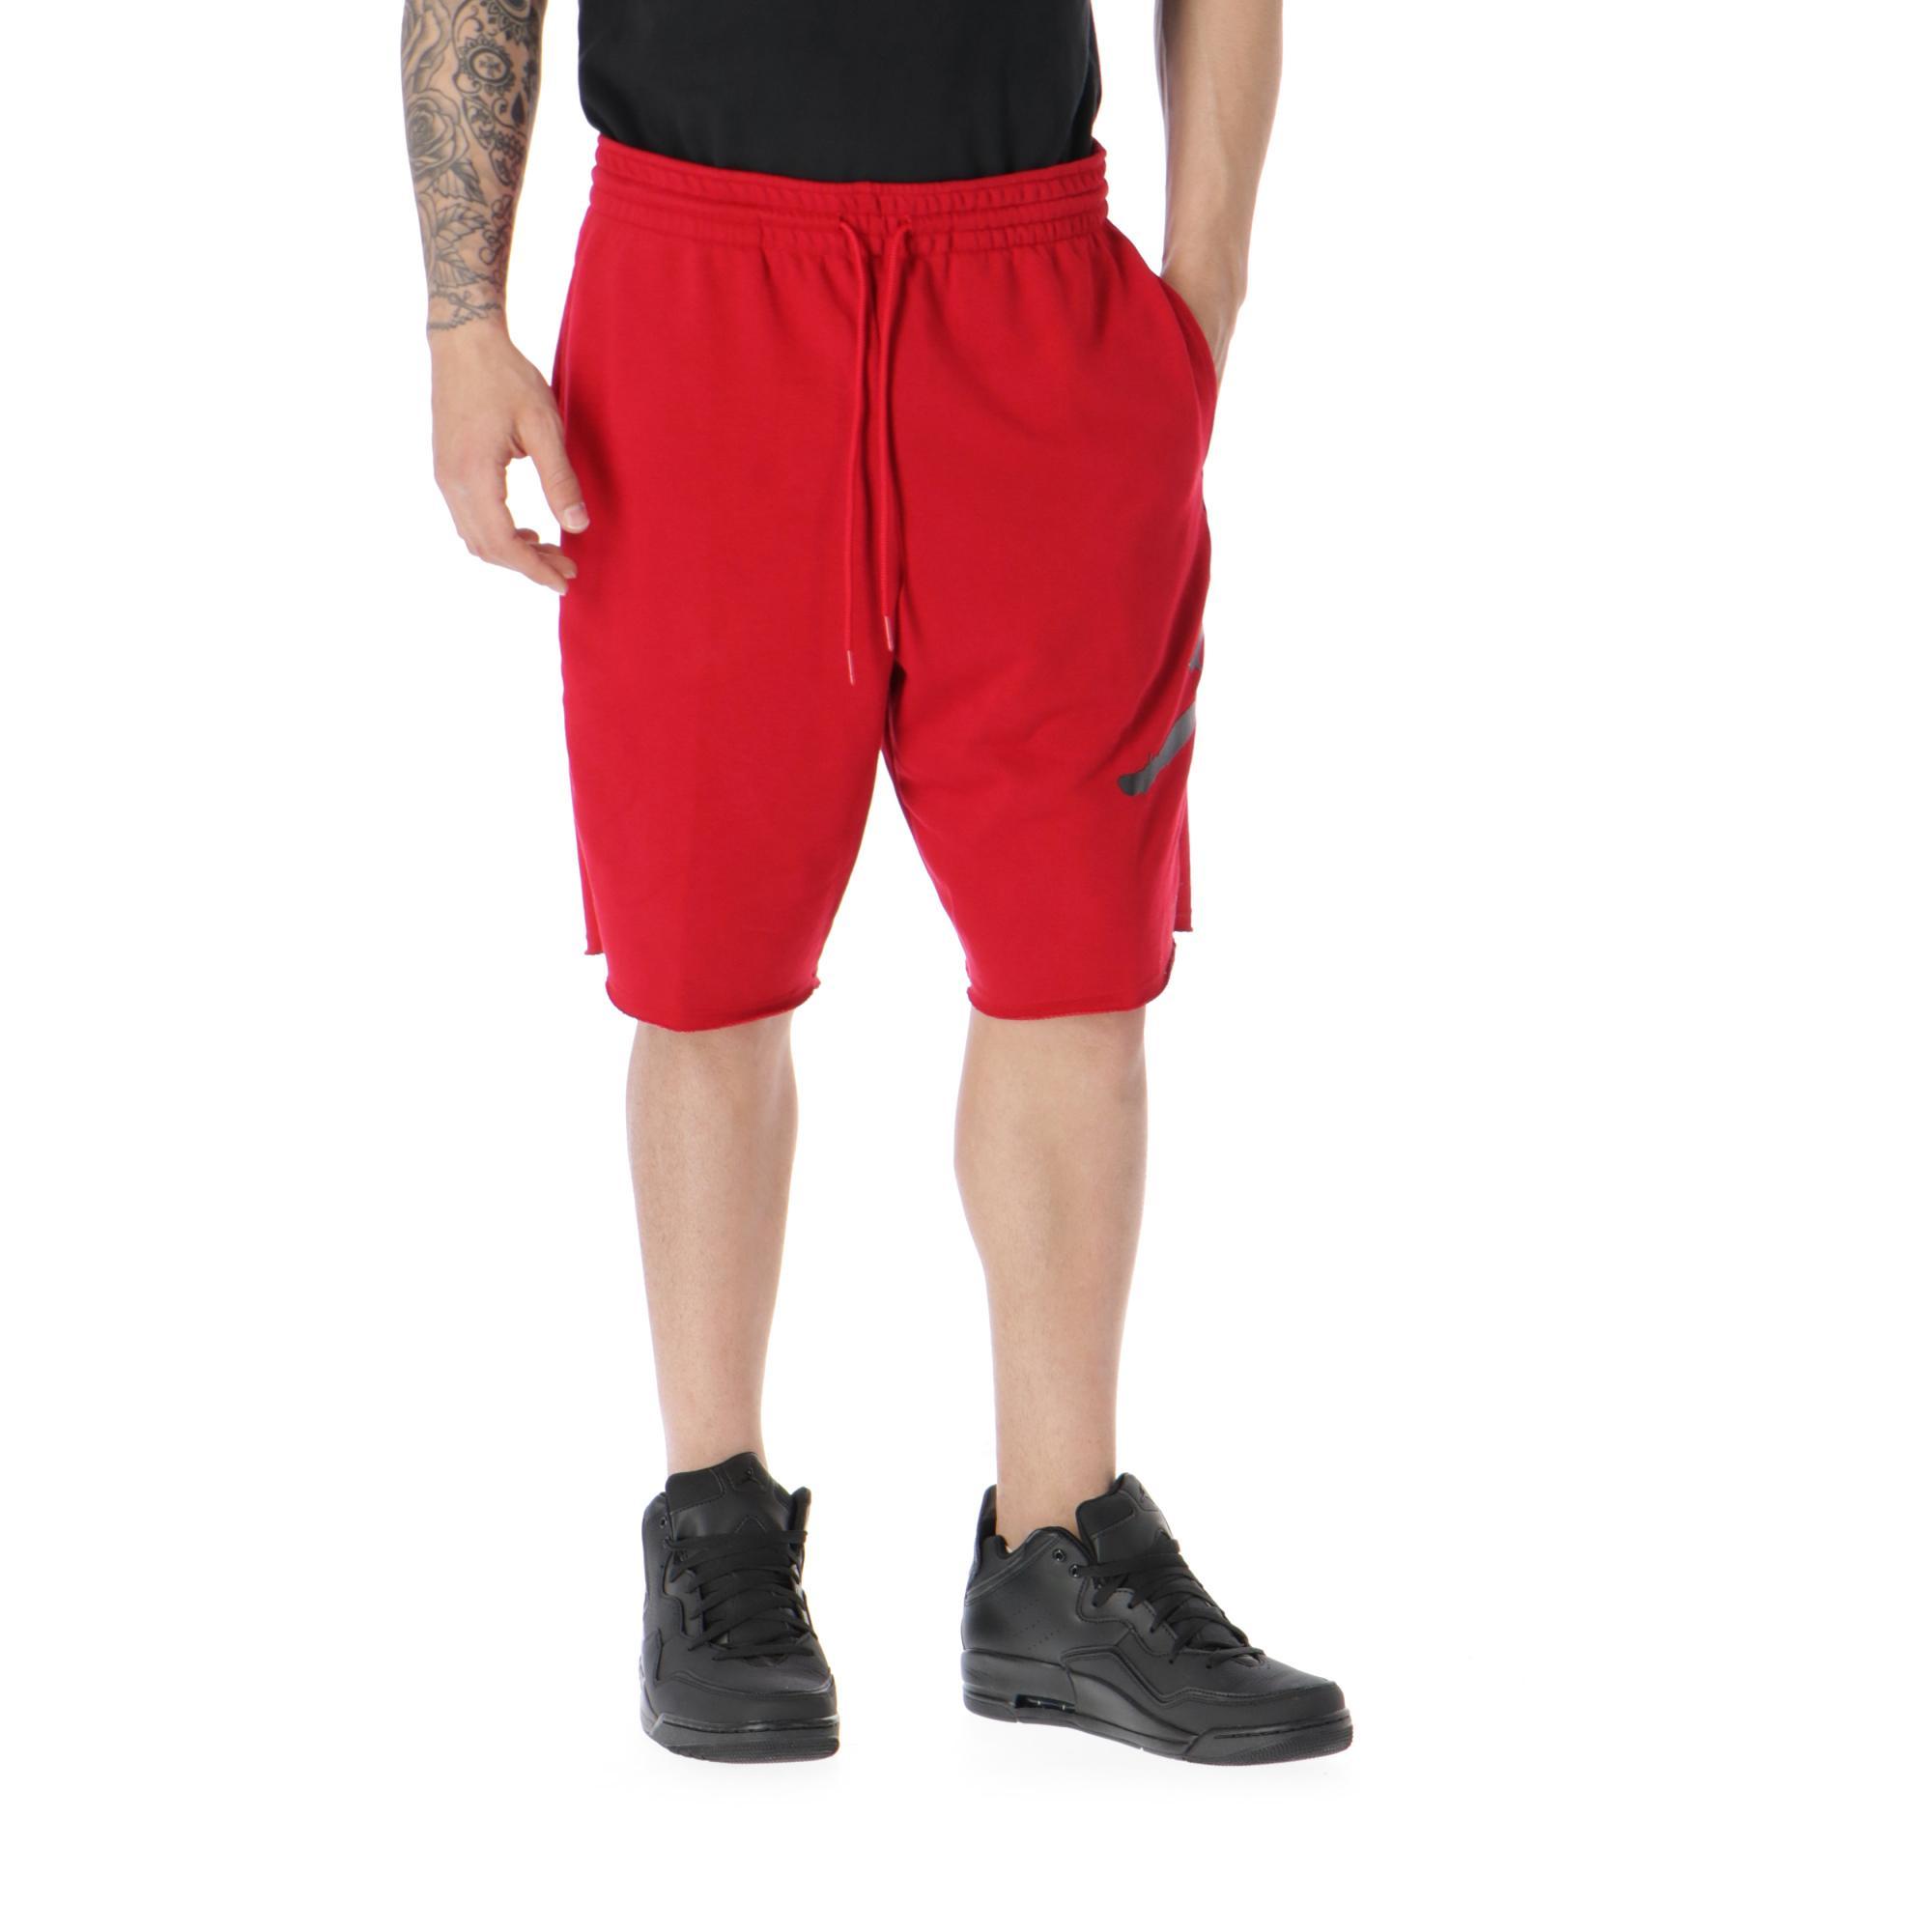 cheap for discount 59db7 a30f5 Jordan Jumpman Air Fleece Short Gym red black